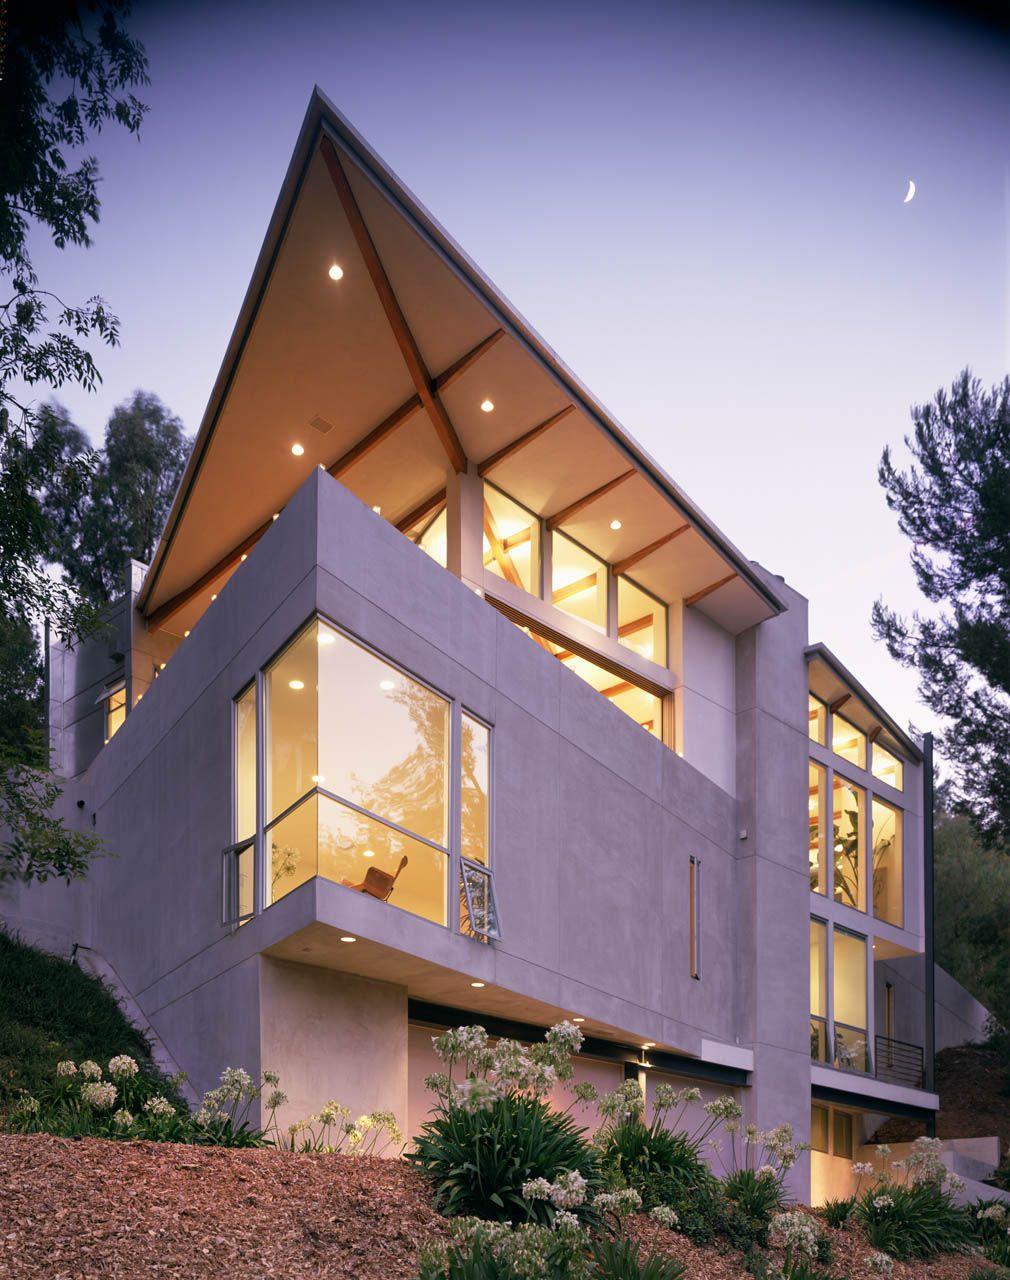 Flint Peak Residence Belzberg Architects Pasadena Ca Doors - Open-air-sculpture-residence-by-marek-rytych-architekt